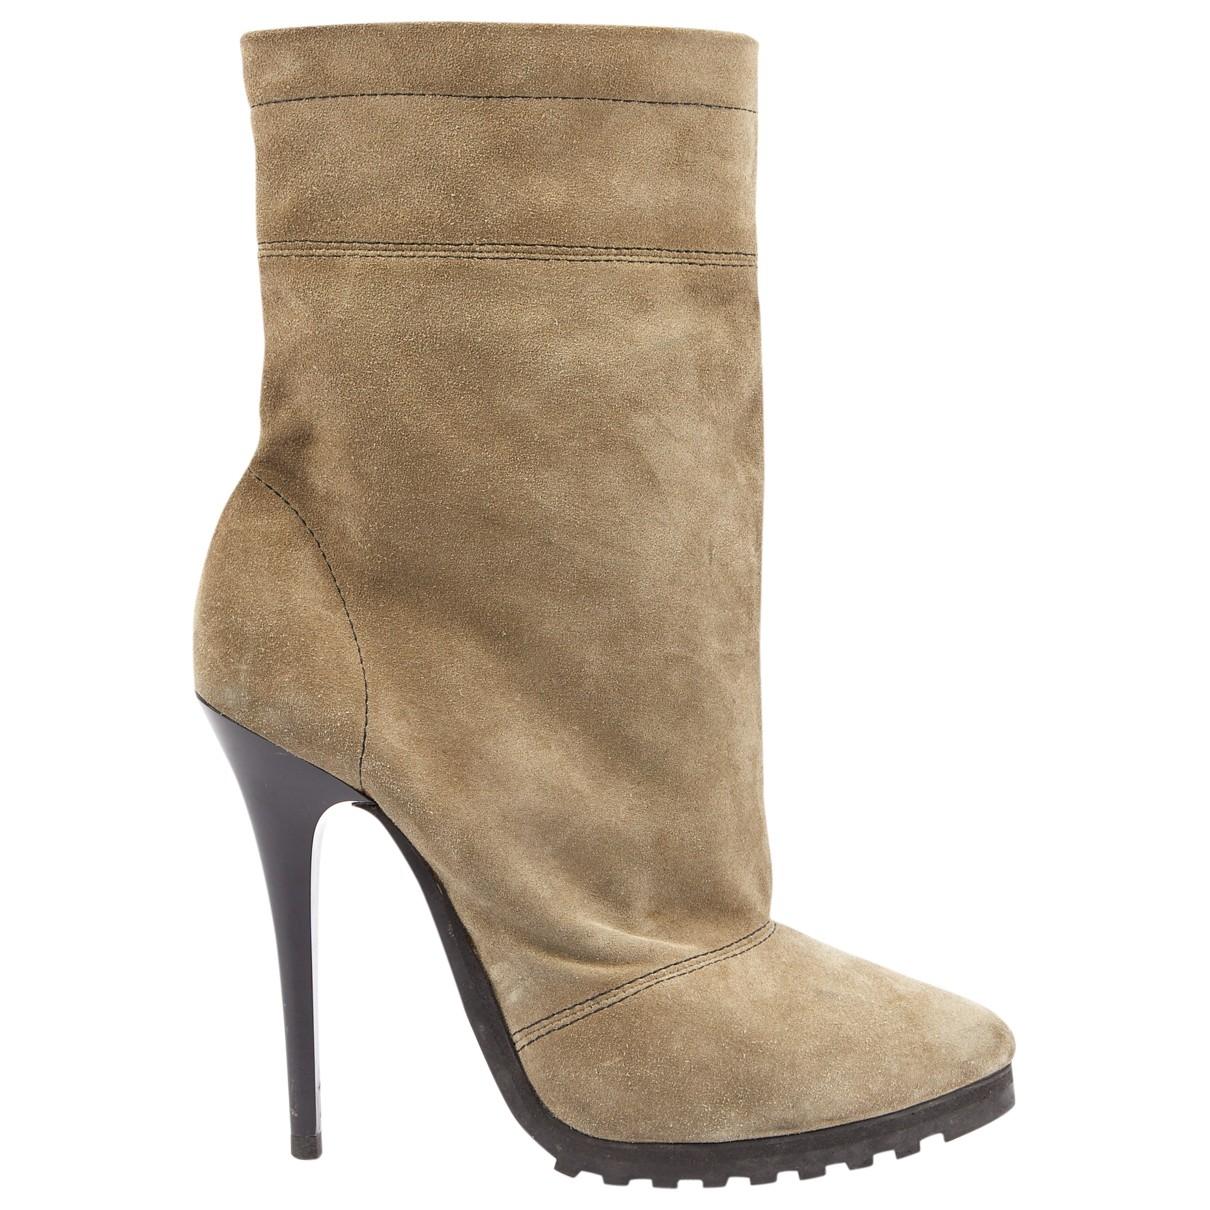 Giuseppe Zanotti - Boots   pour femme en suede - kaki